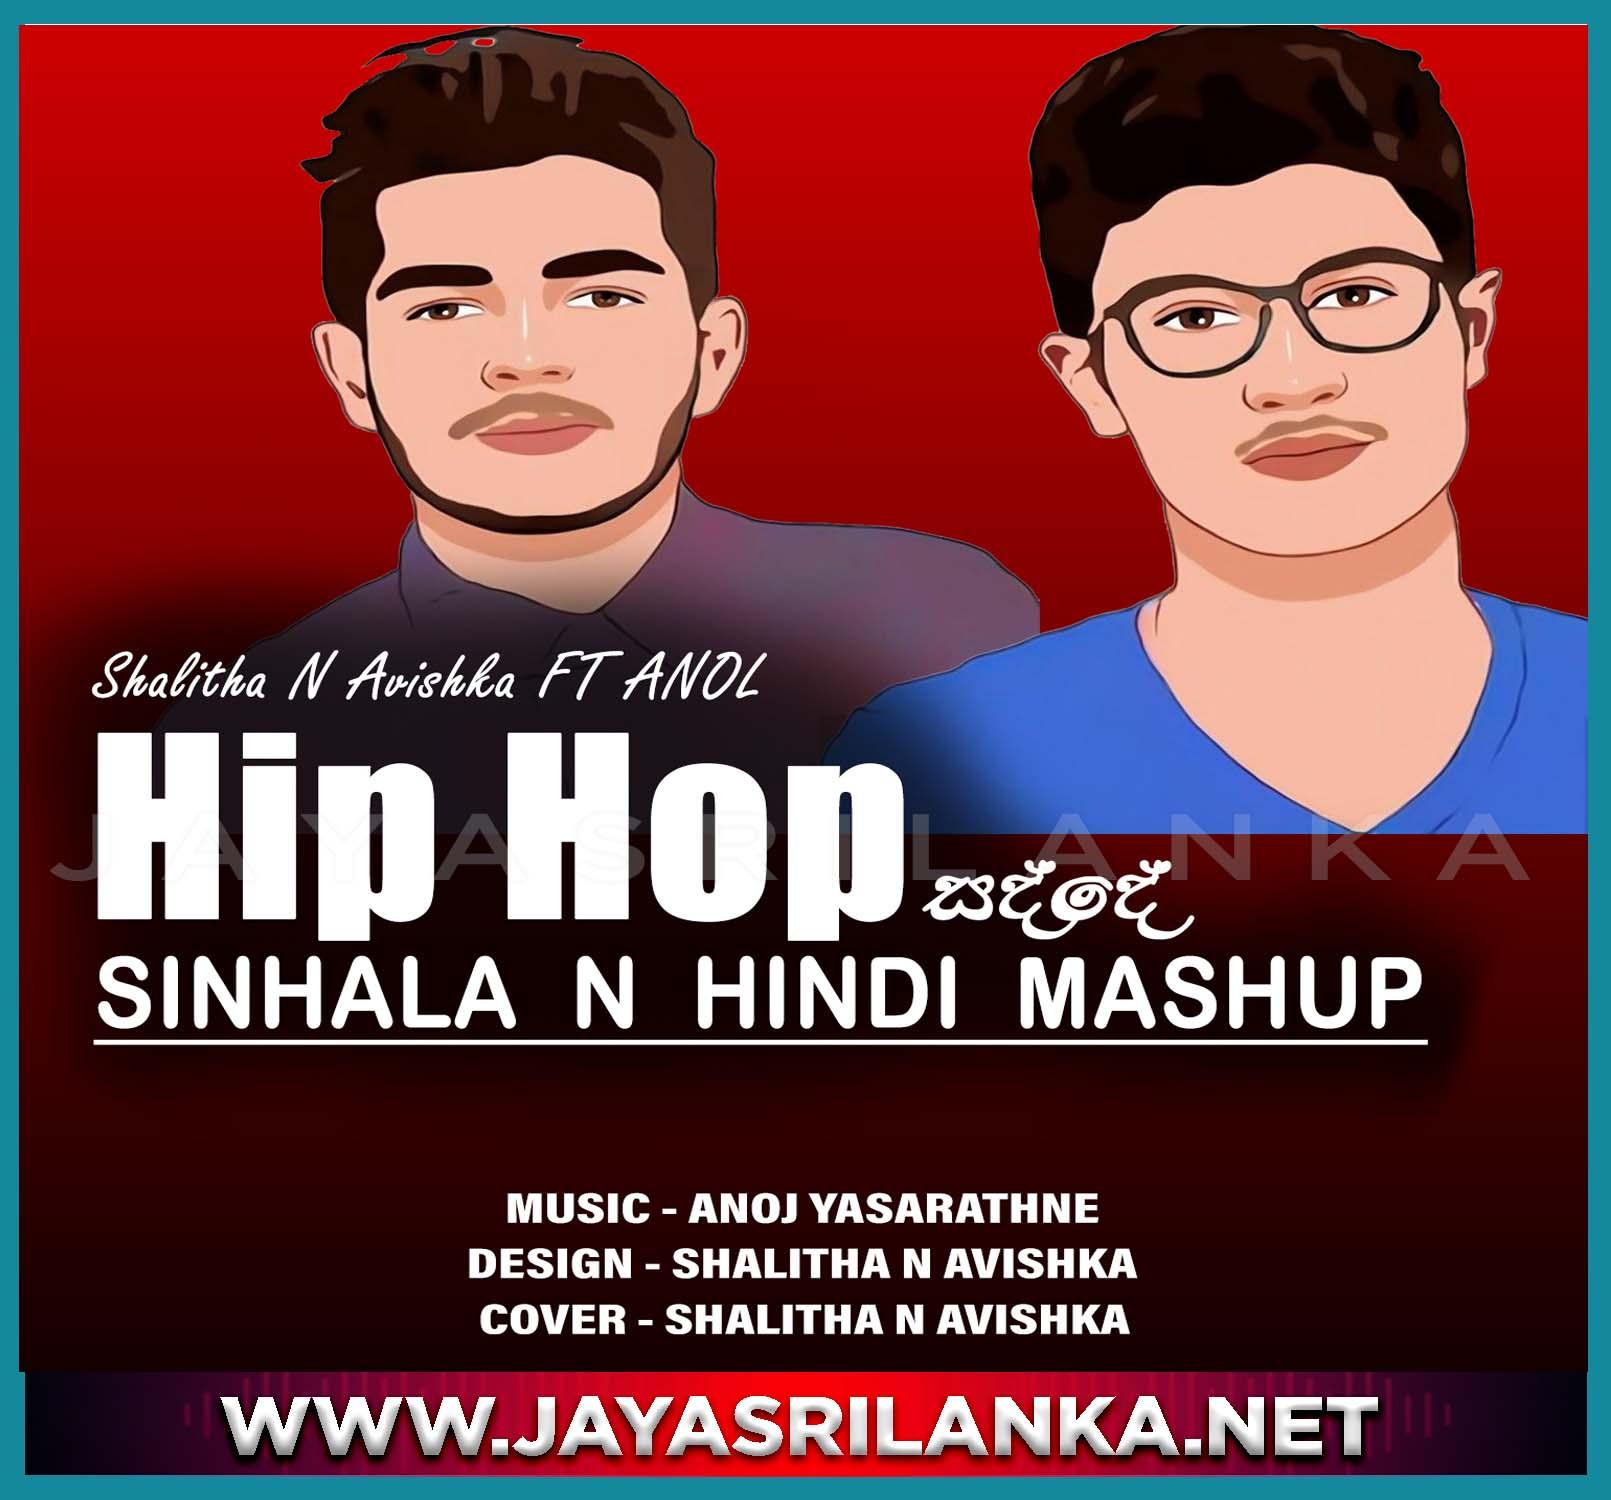 Sinhala N Hindi Mashup Cover